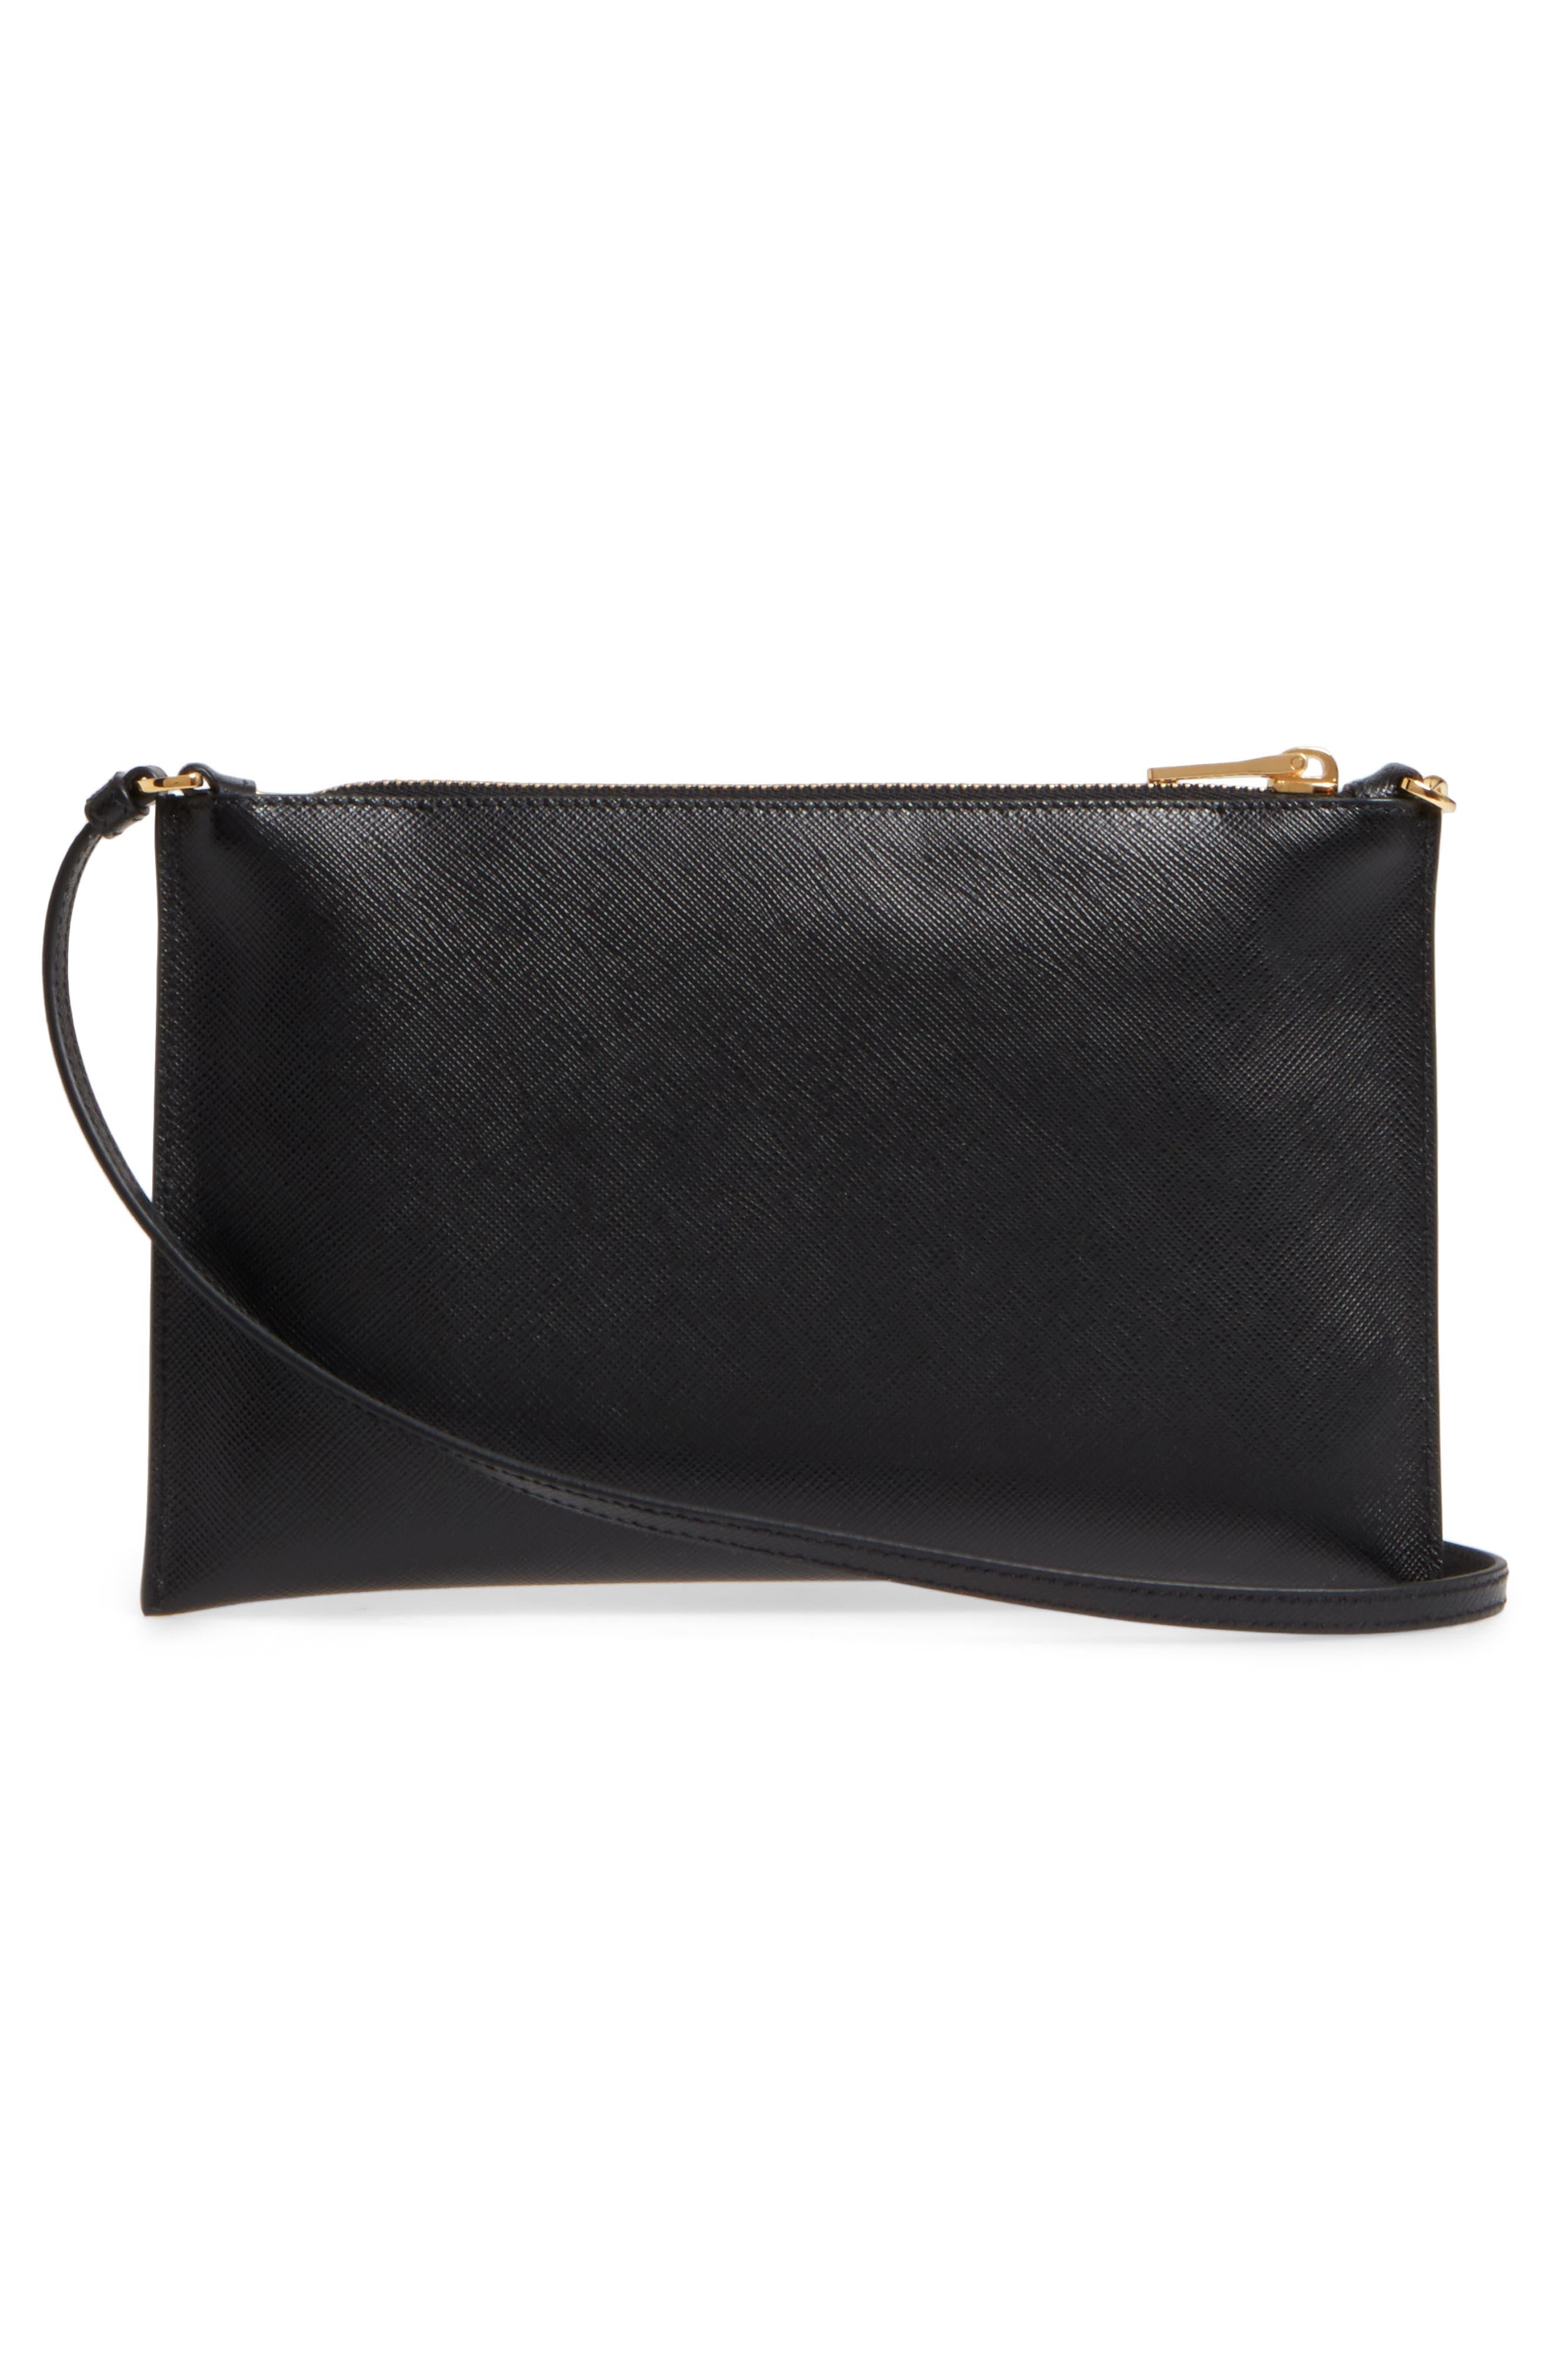 Small Saffiano Leather Shoulder Bag,                             Alternate thumbnail 3, color,                             F0002 NERO